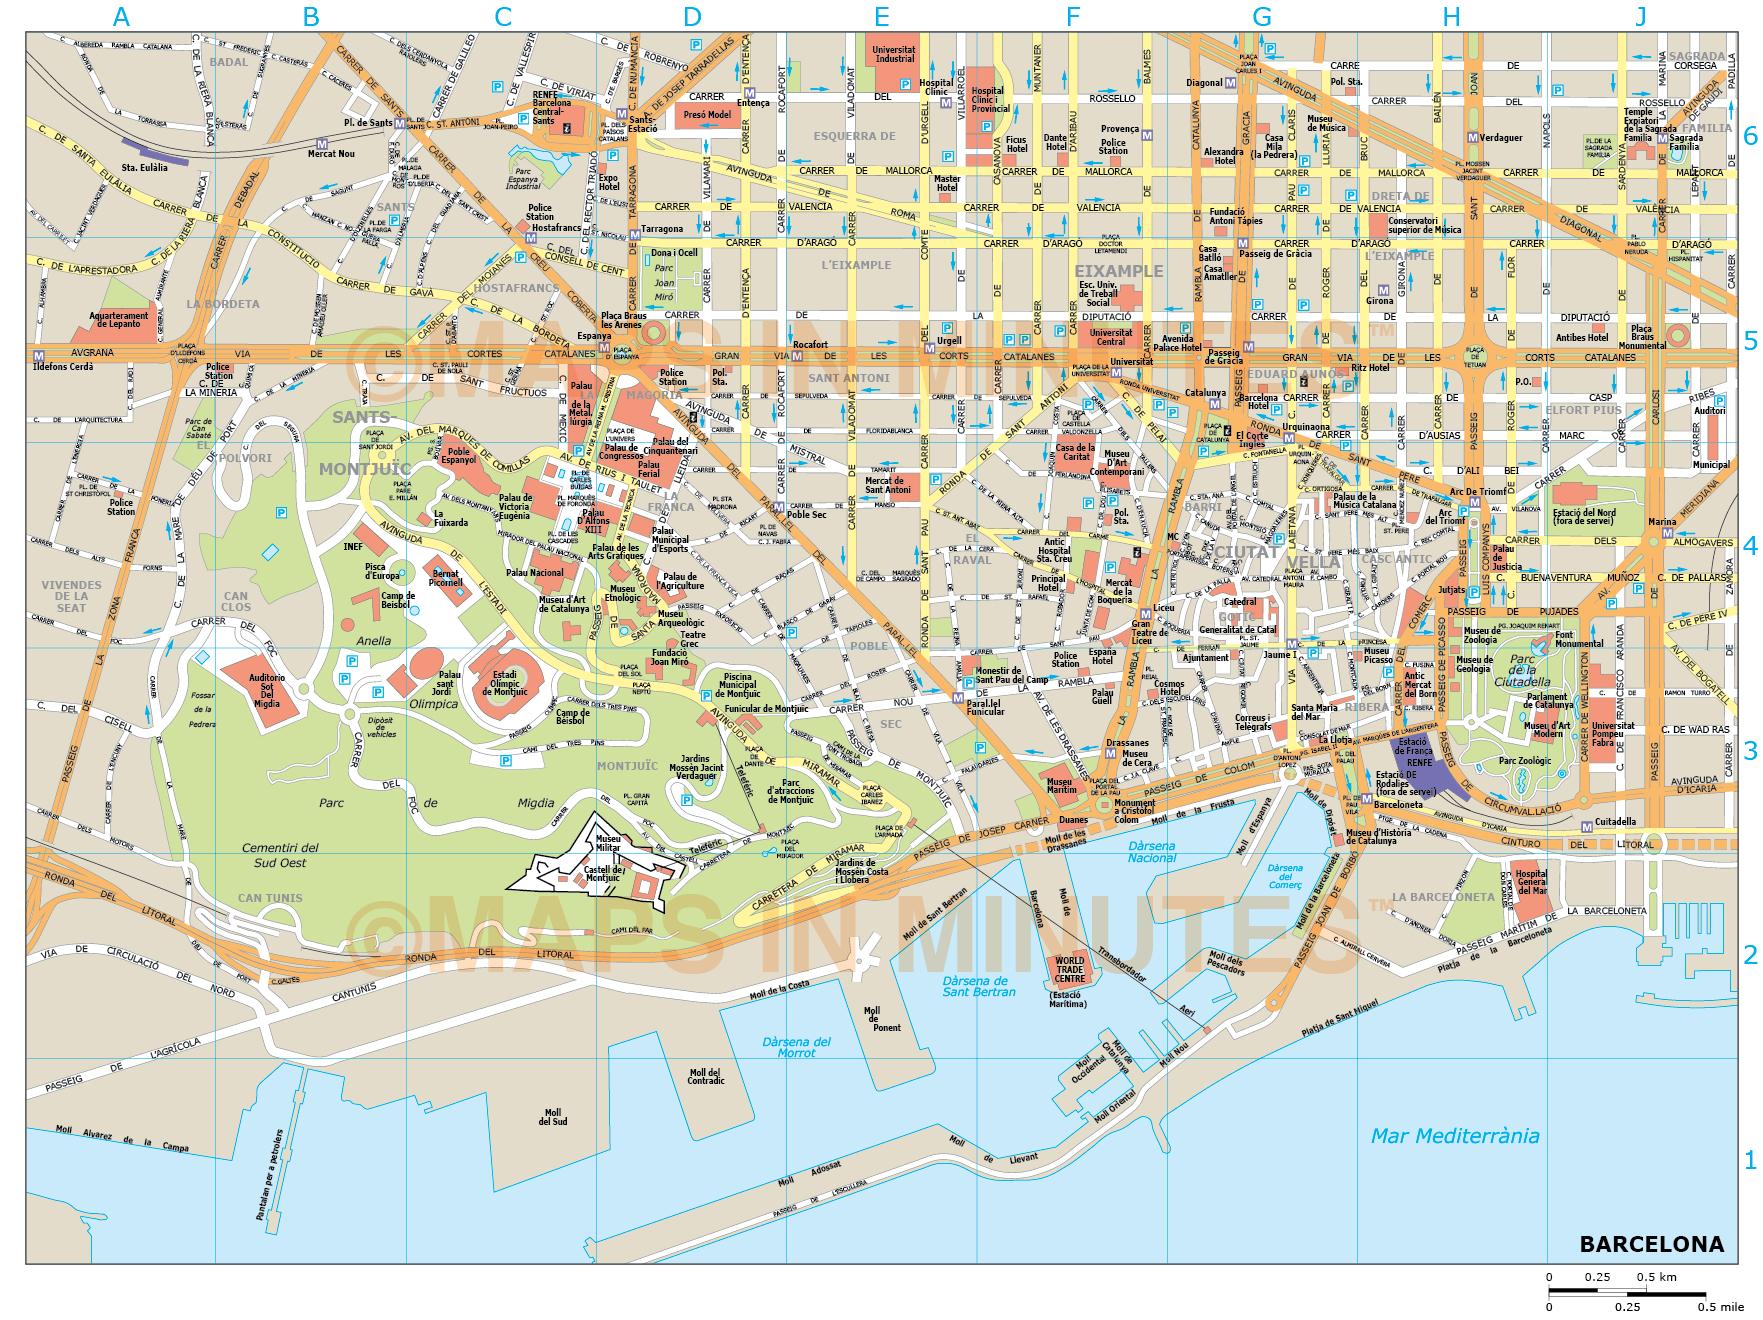 Printable Map Of Barcelona And Travel Information | Download Free - City Map Of Barcelona Printable